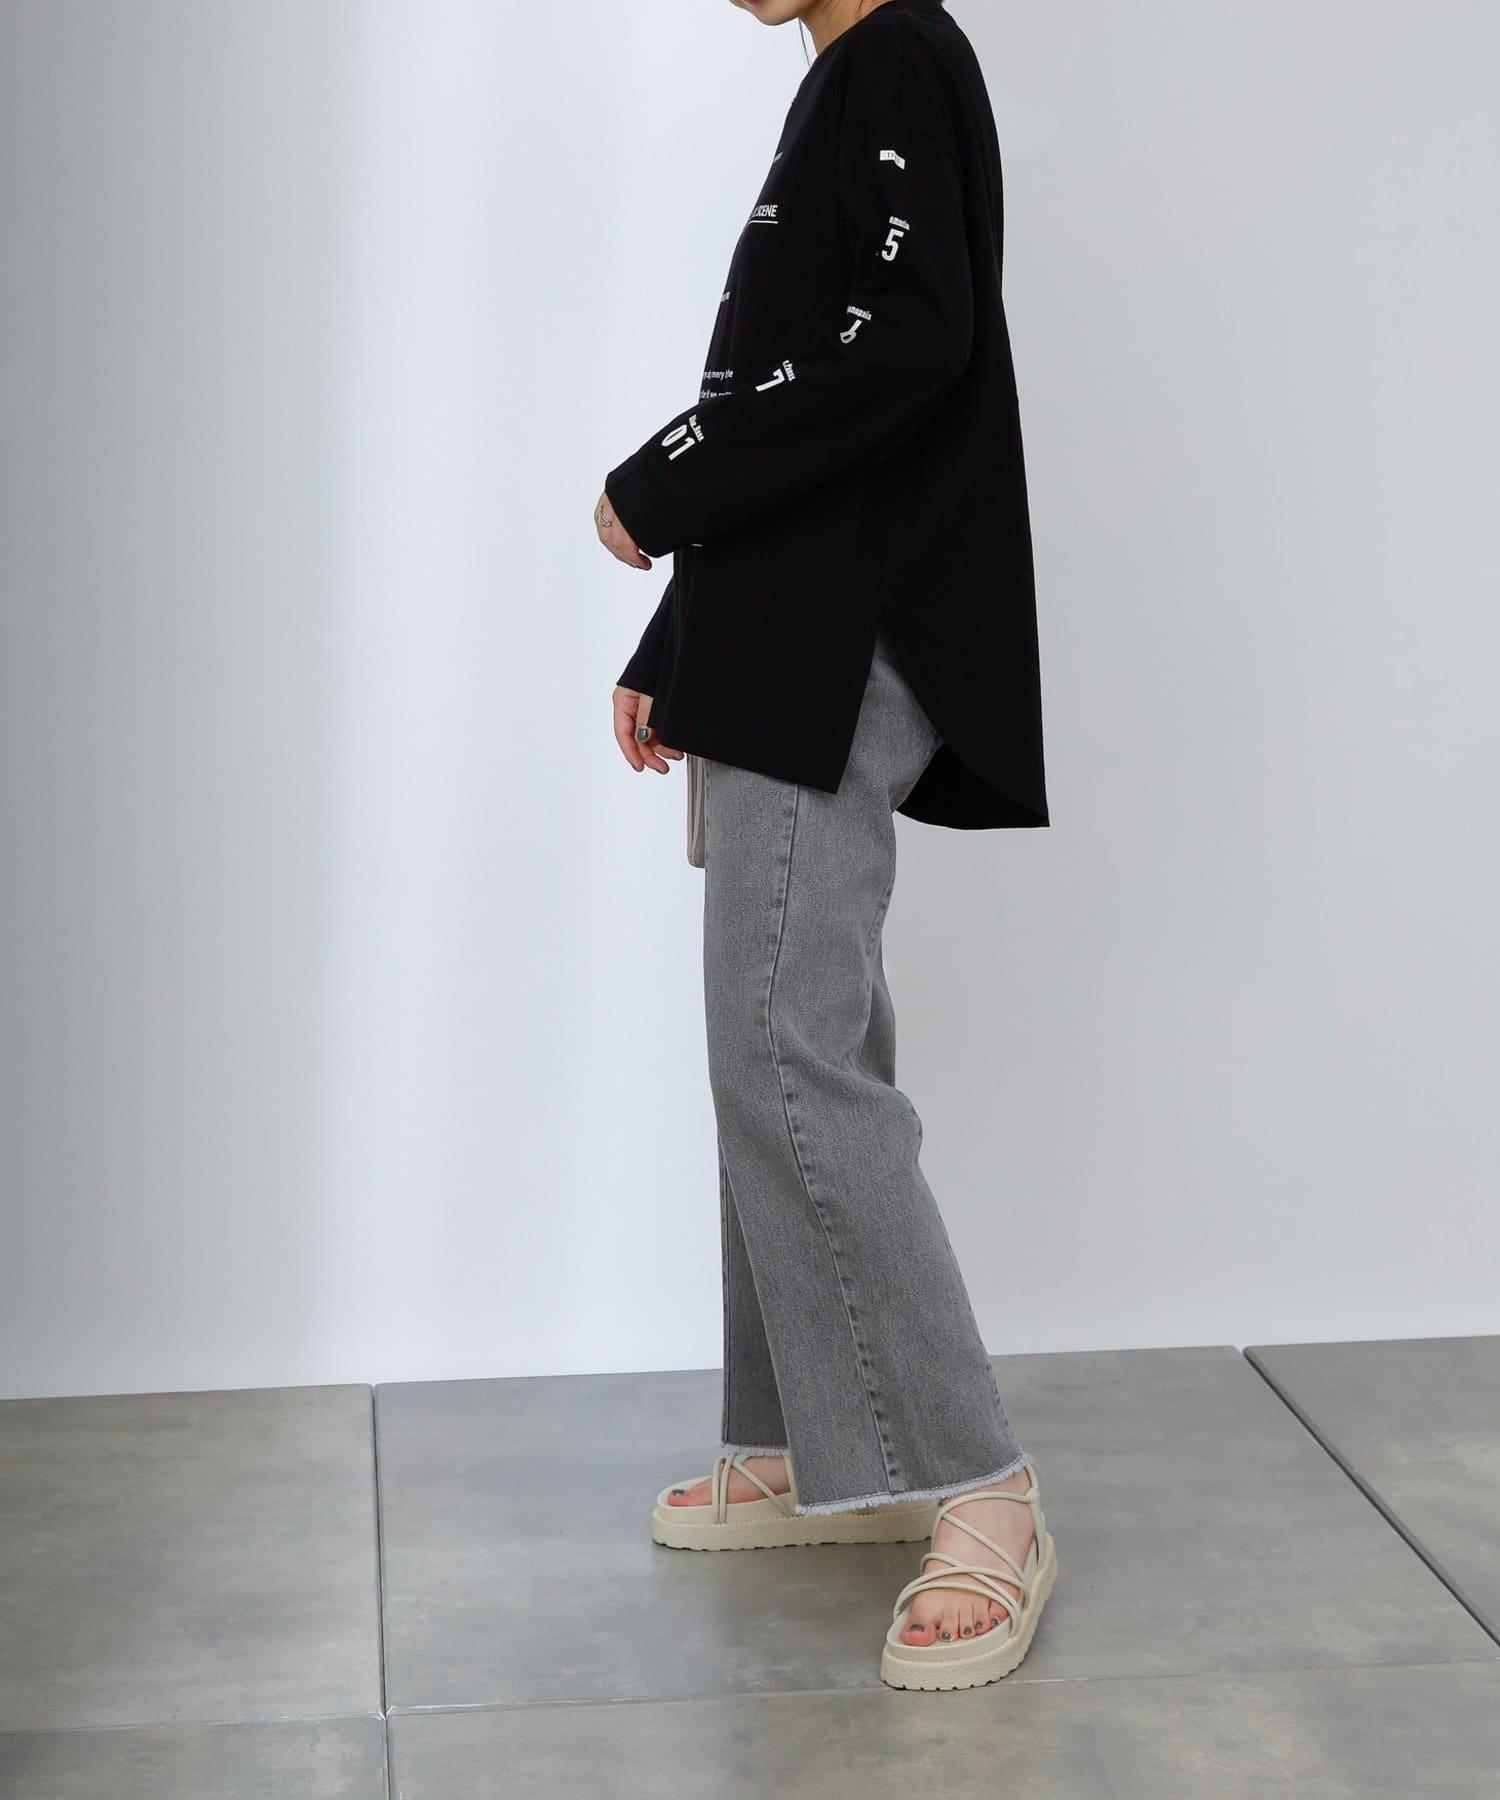 COLONY 2139(コロニー トゥーワンスリーナイン) 裾フリンジセンターシームデニムパンツ